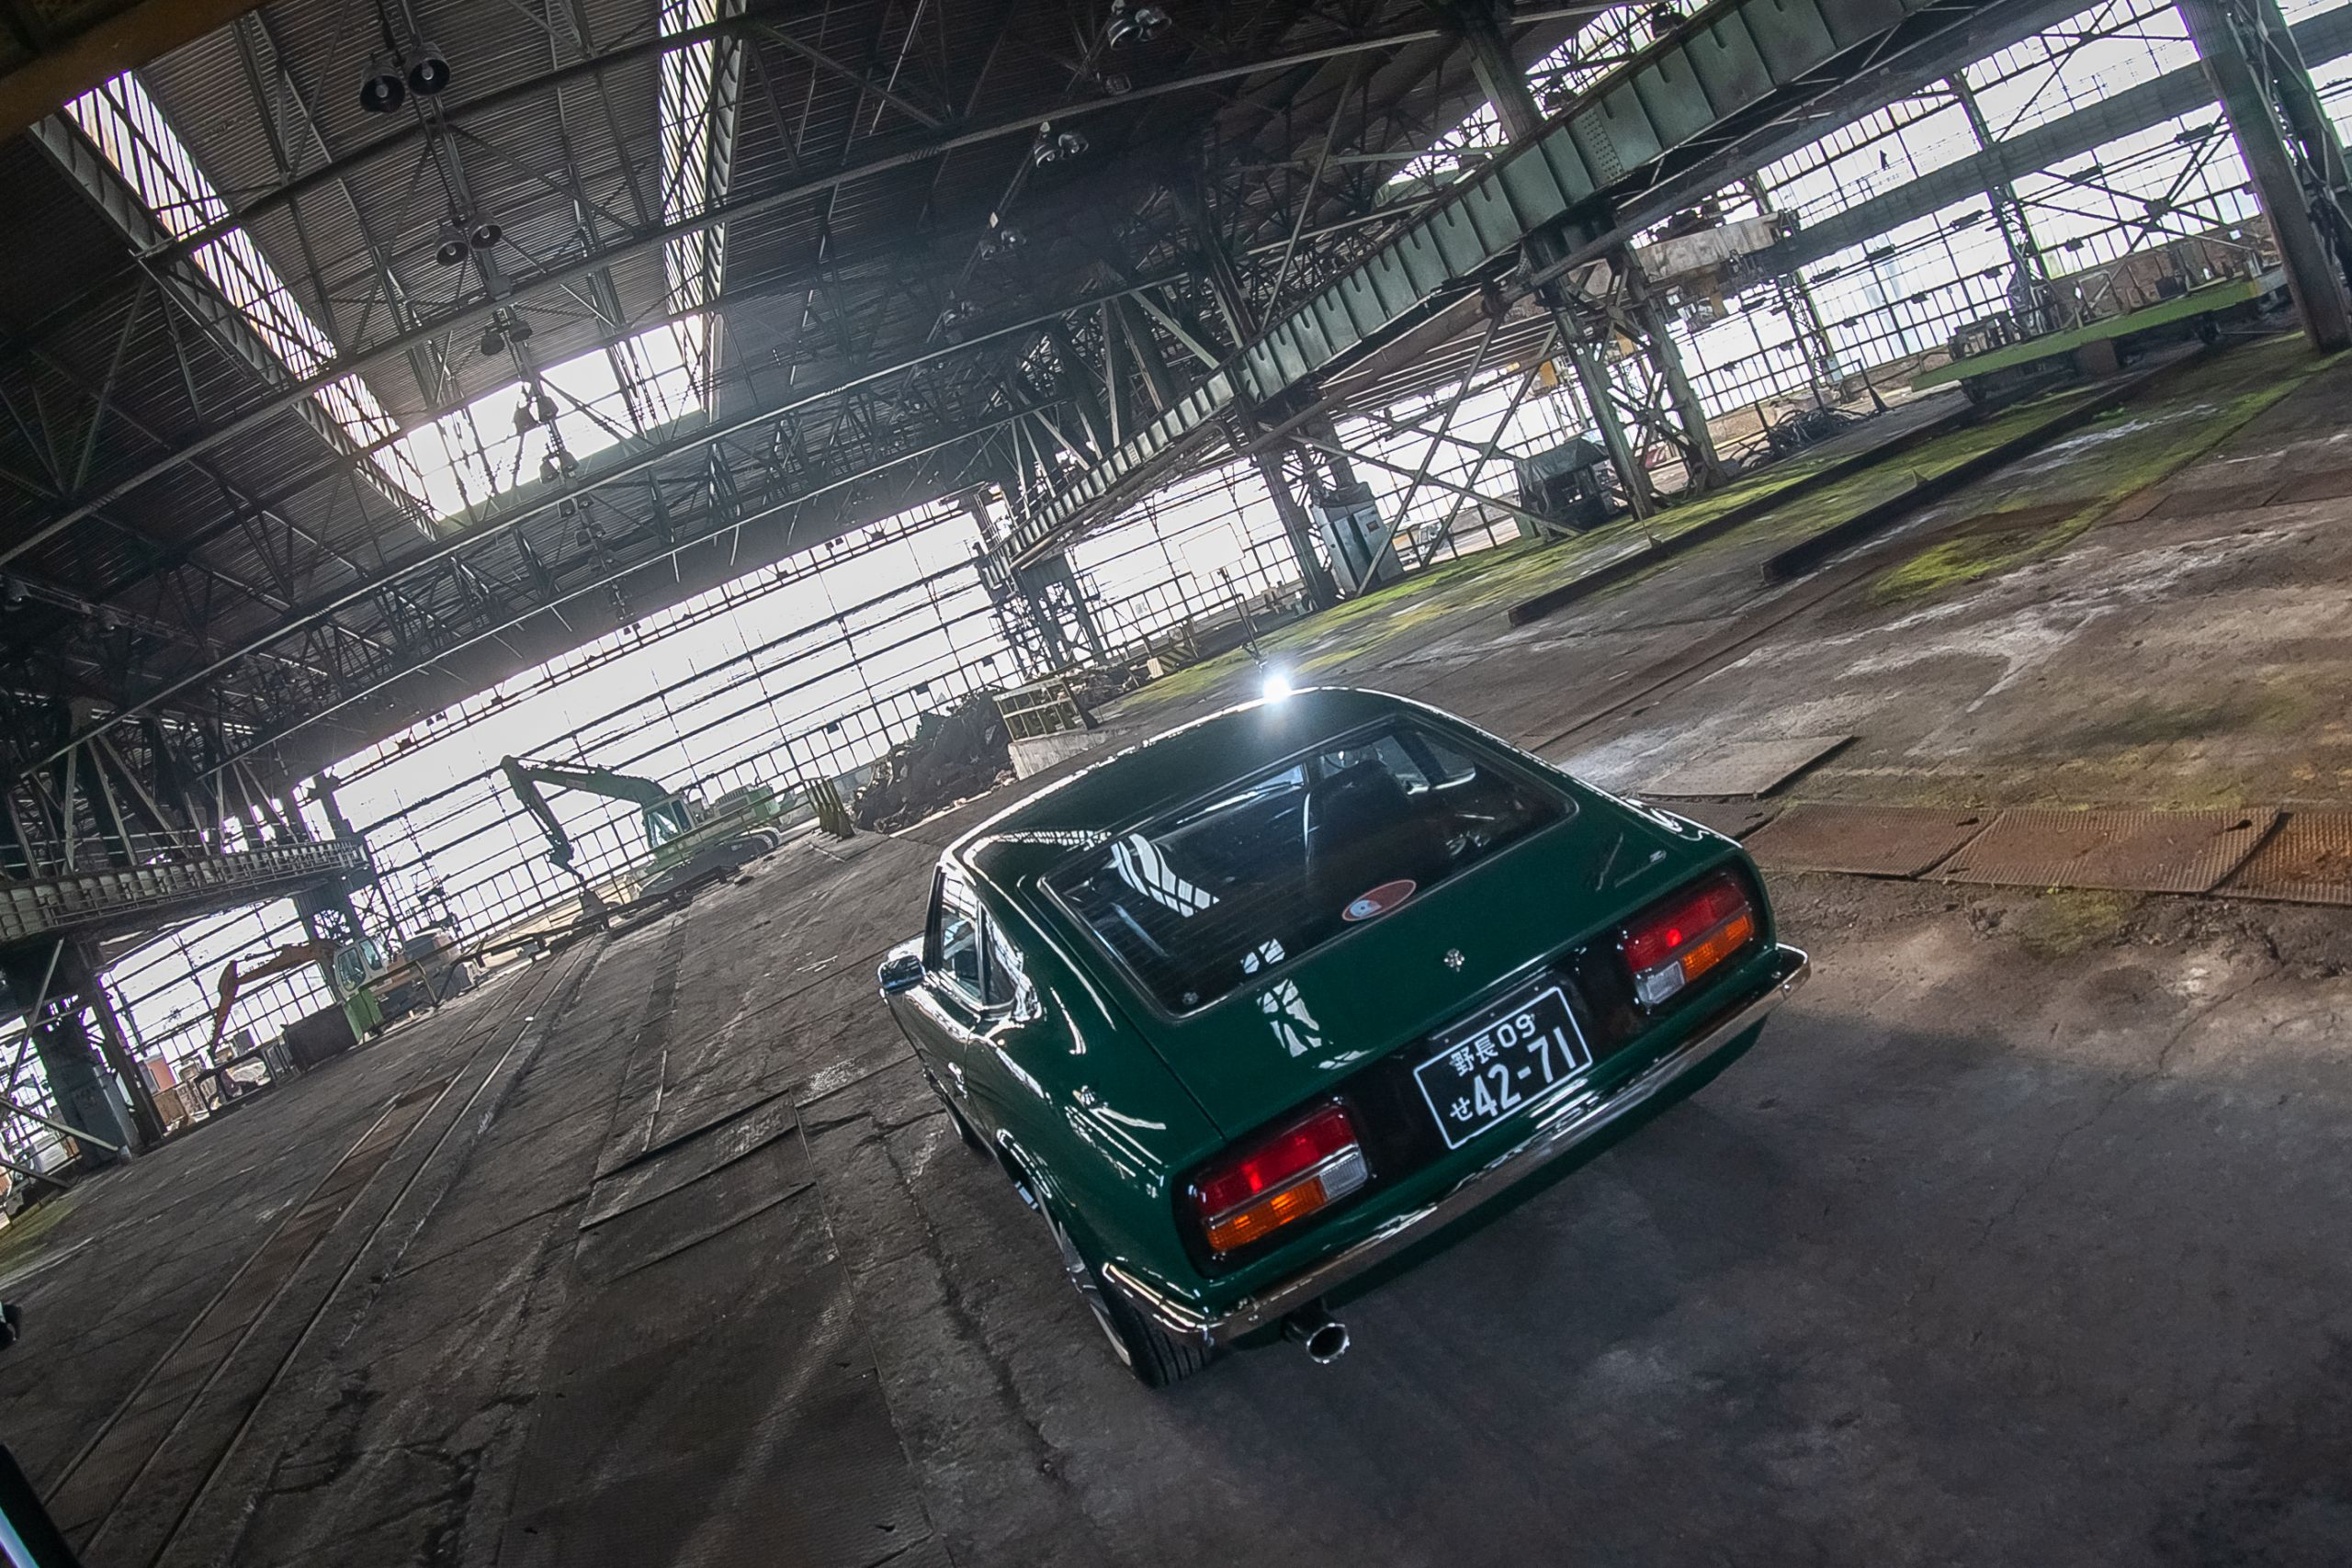 1972 Datsun 240z Niedriger Kilometerstand zu verkaufen